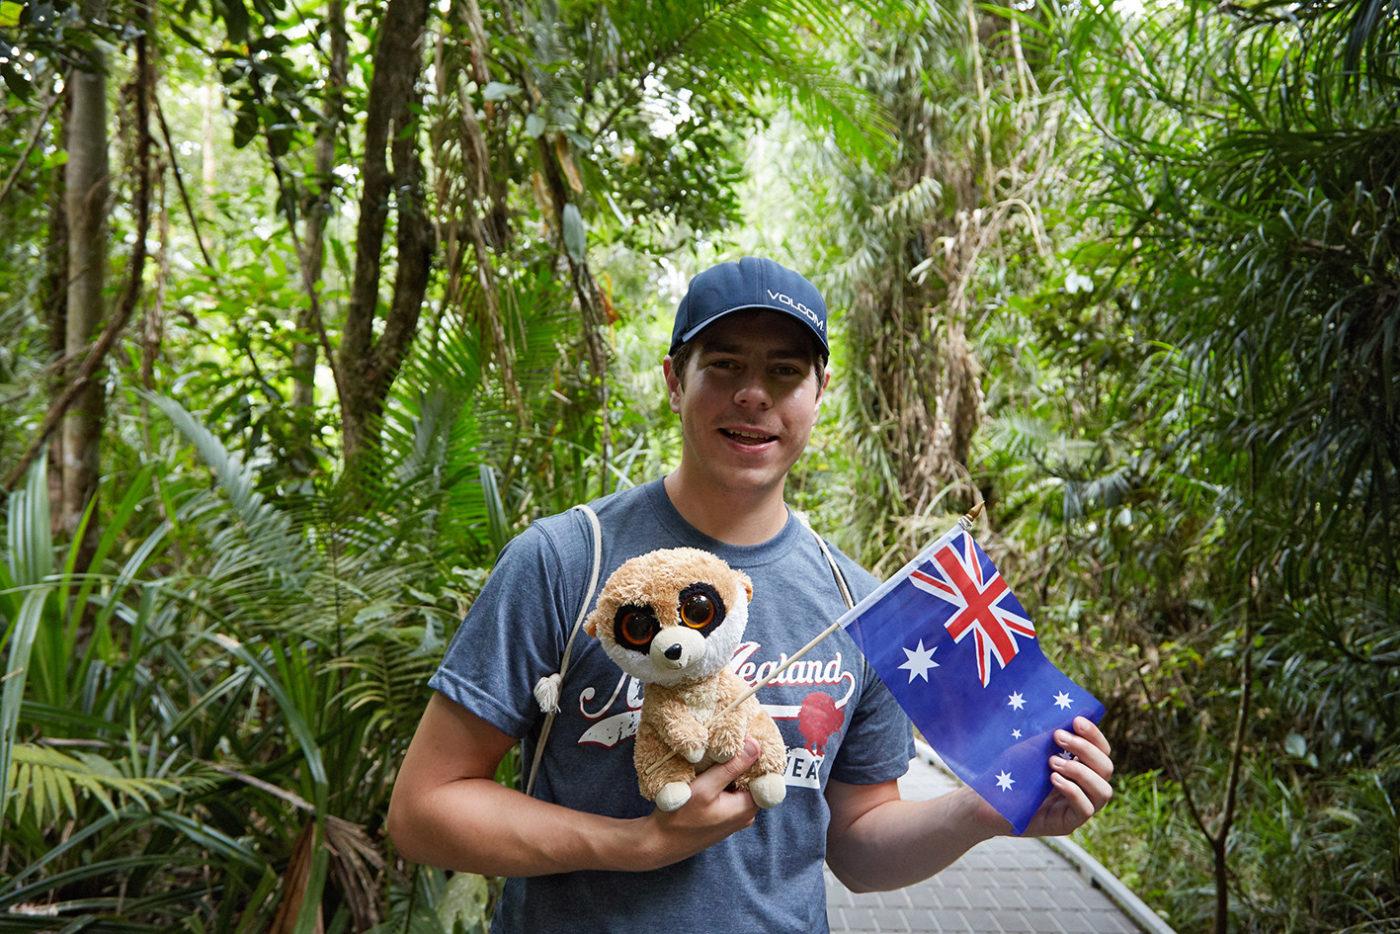 daintree nationalpark, ed, ed das erdmännchen, milesandshores, miles and shores, reiseblog, travelblog, australien